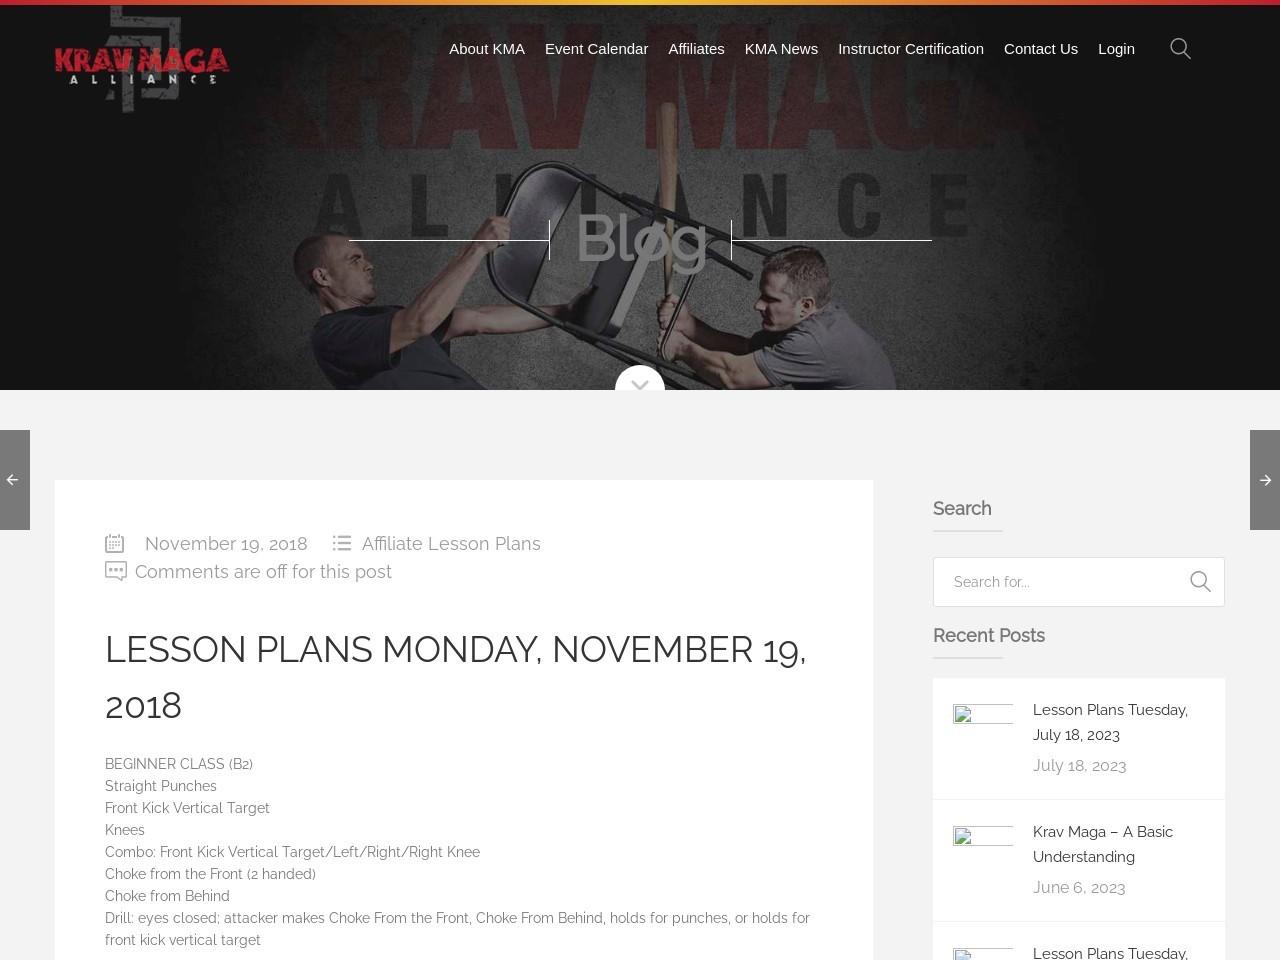 Lesson Plans Monday, November 19, 2018